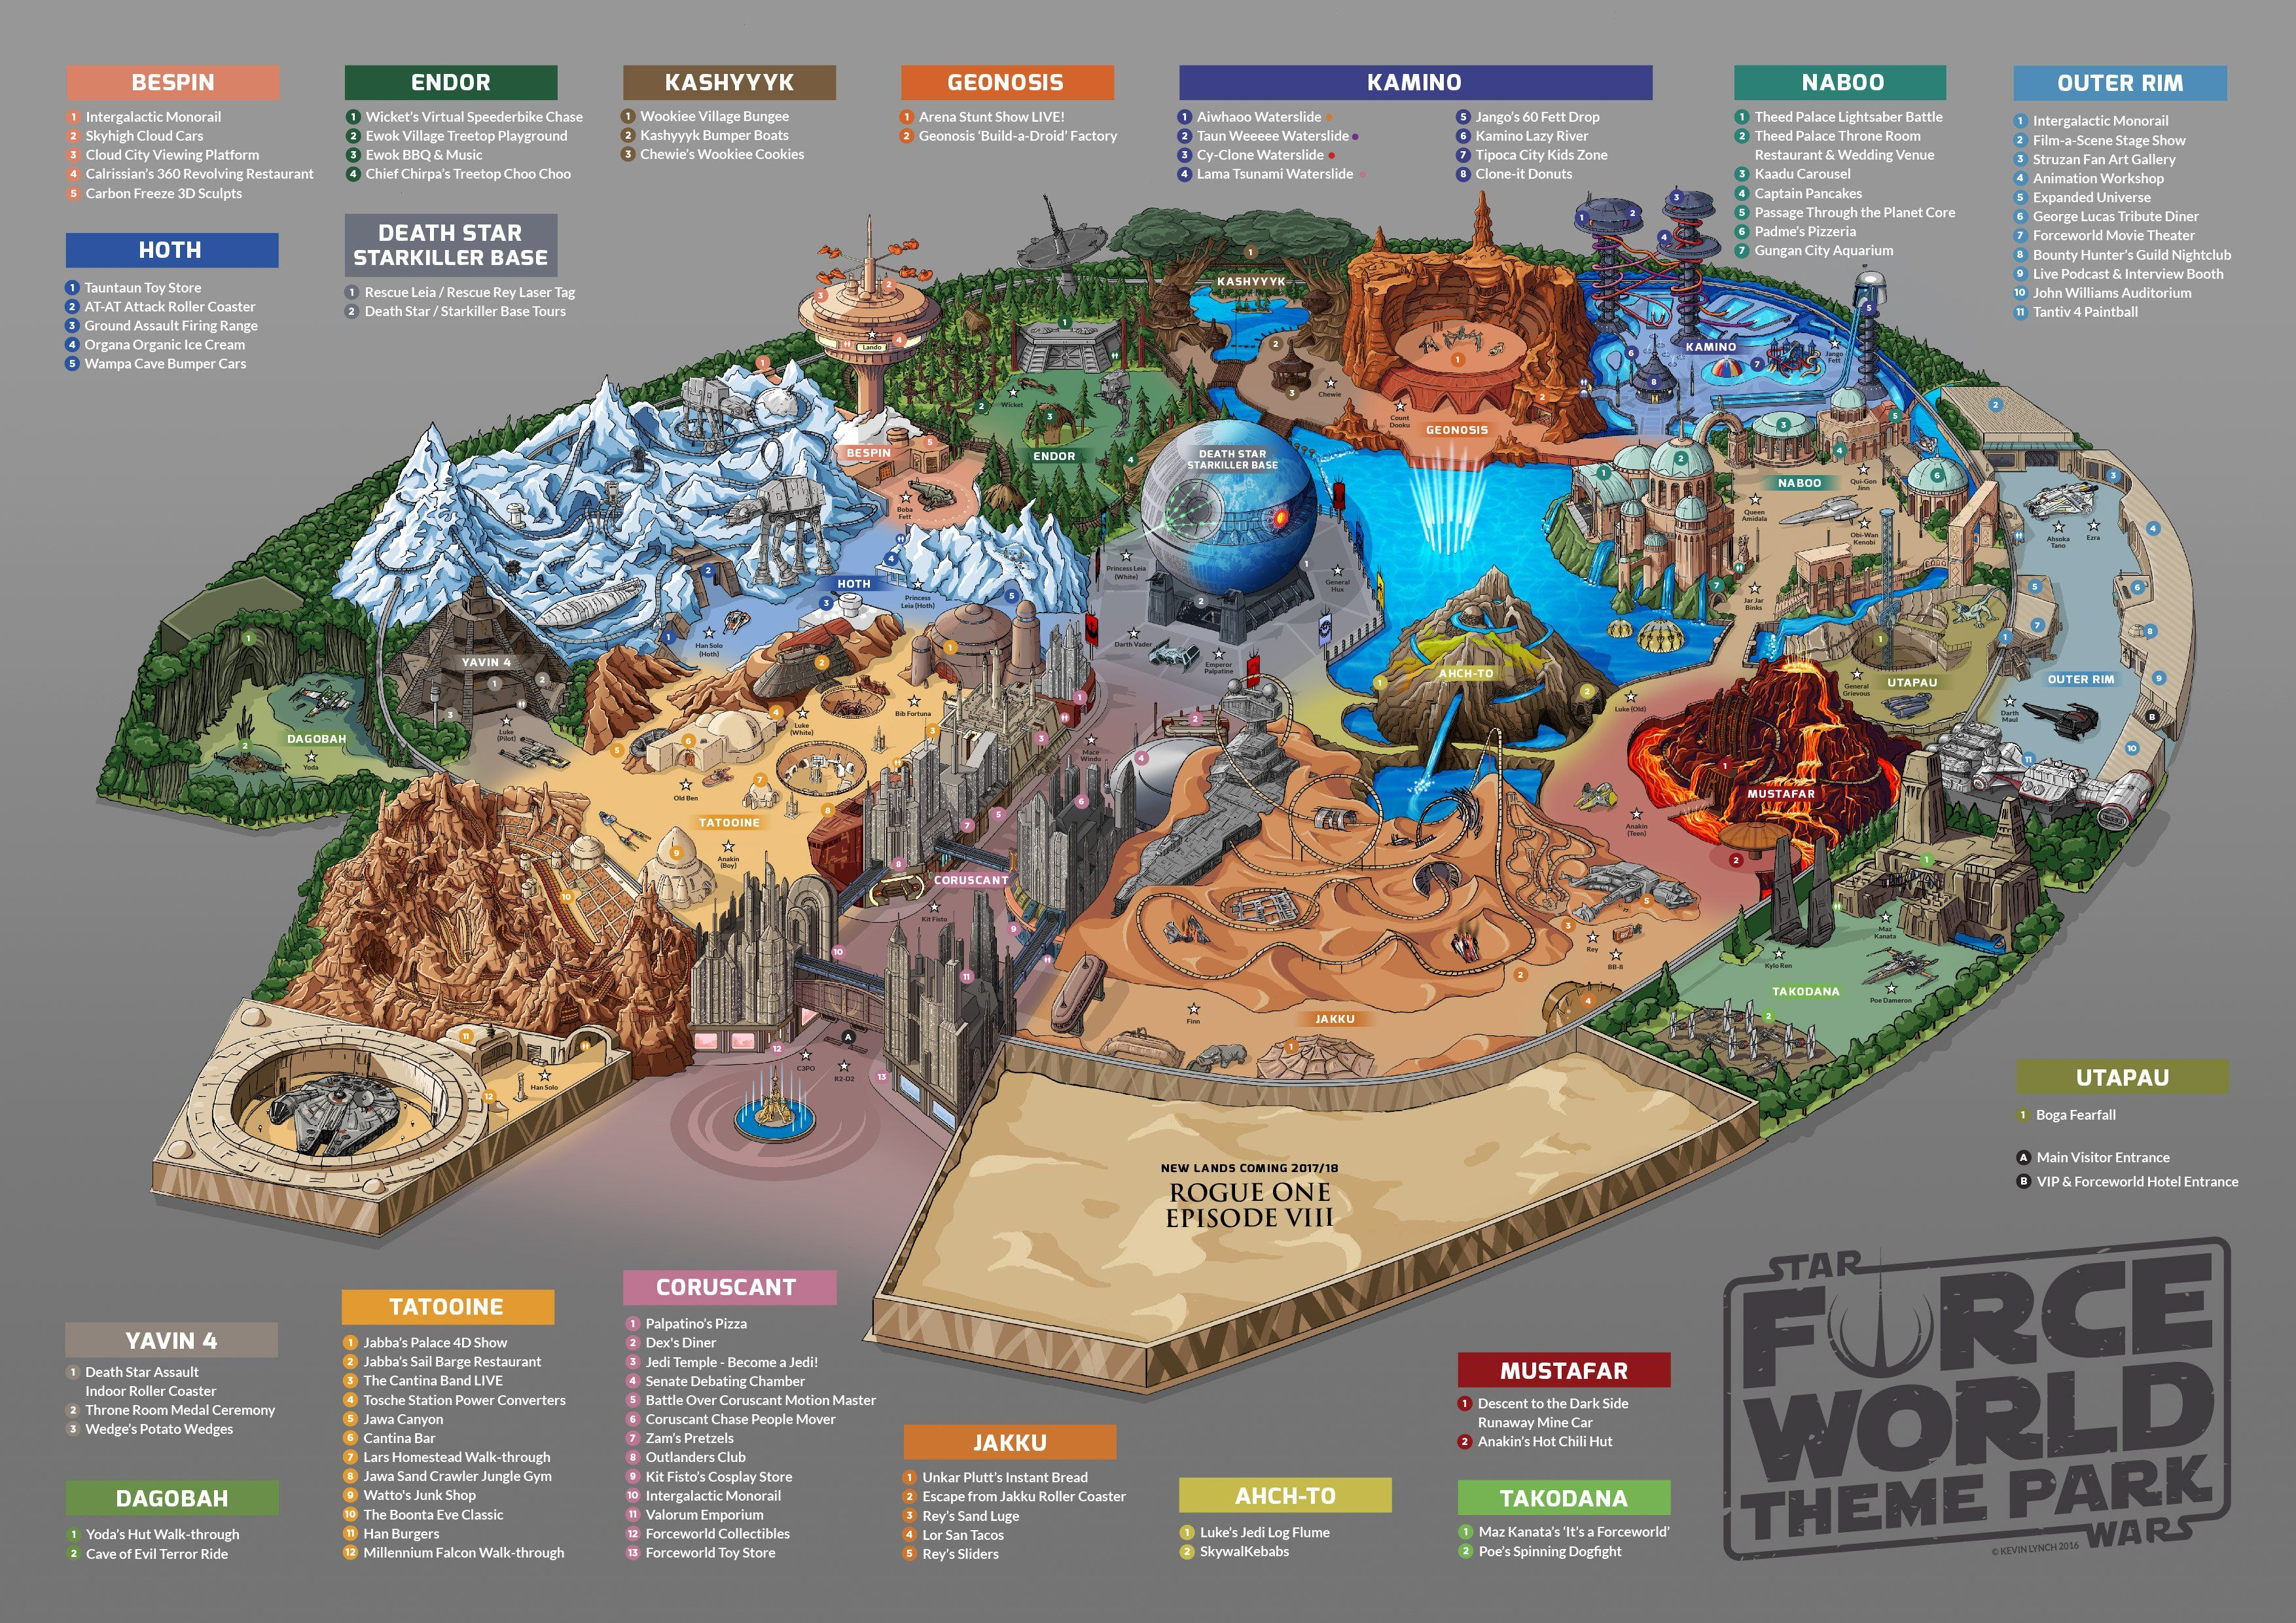 star wars world map Force World Fan Concept For Star Wars Theme Park Star Wars Theme